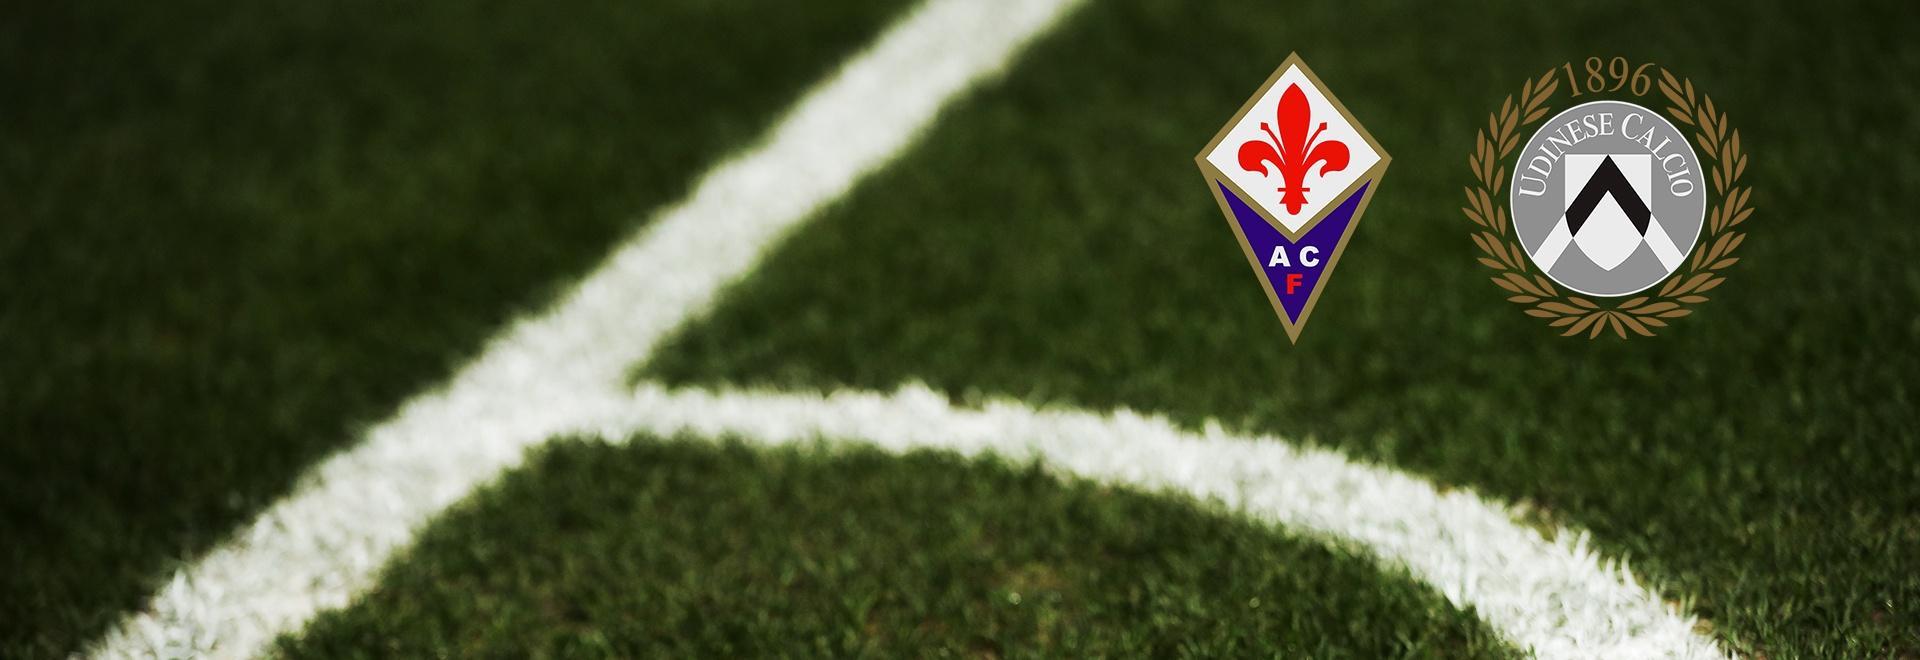 Fiorentina - Udinese. 7a g.